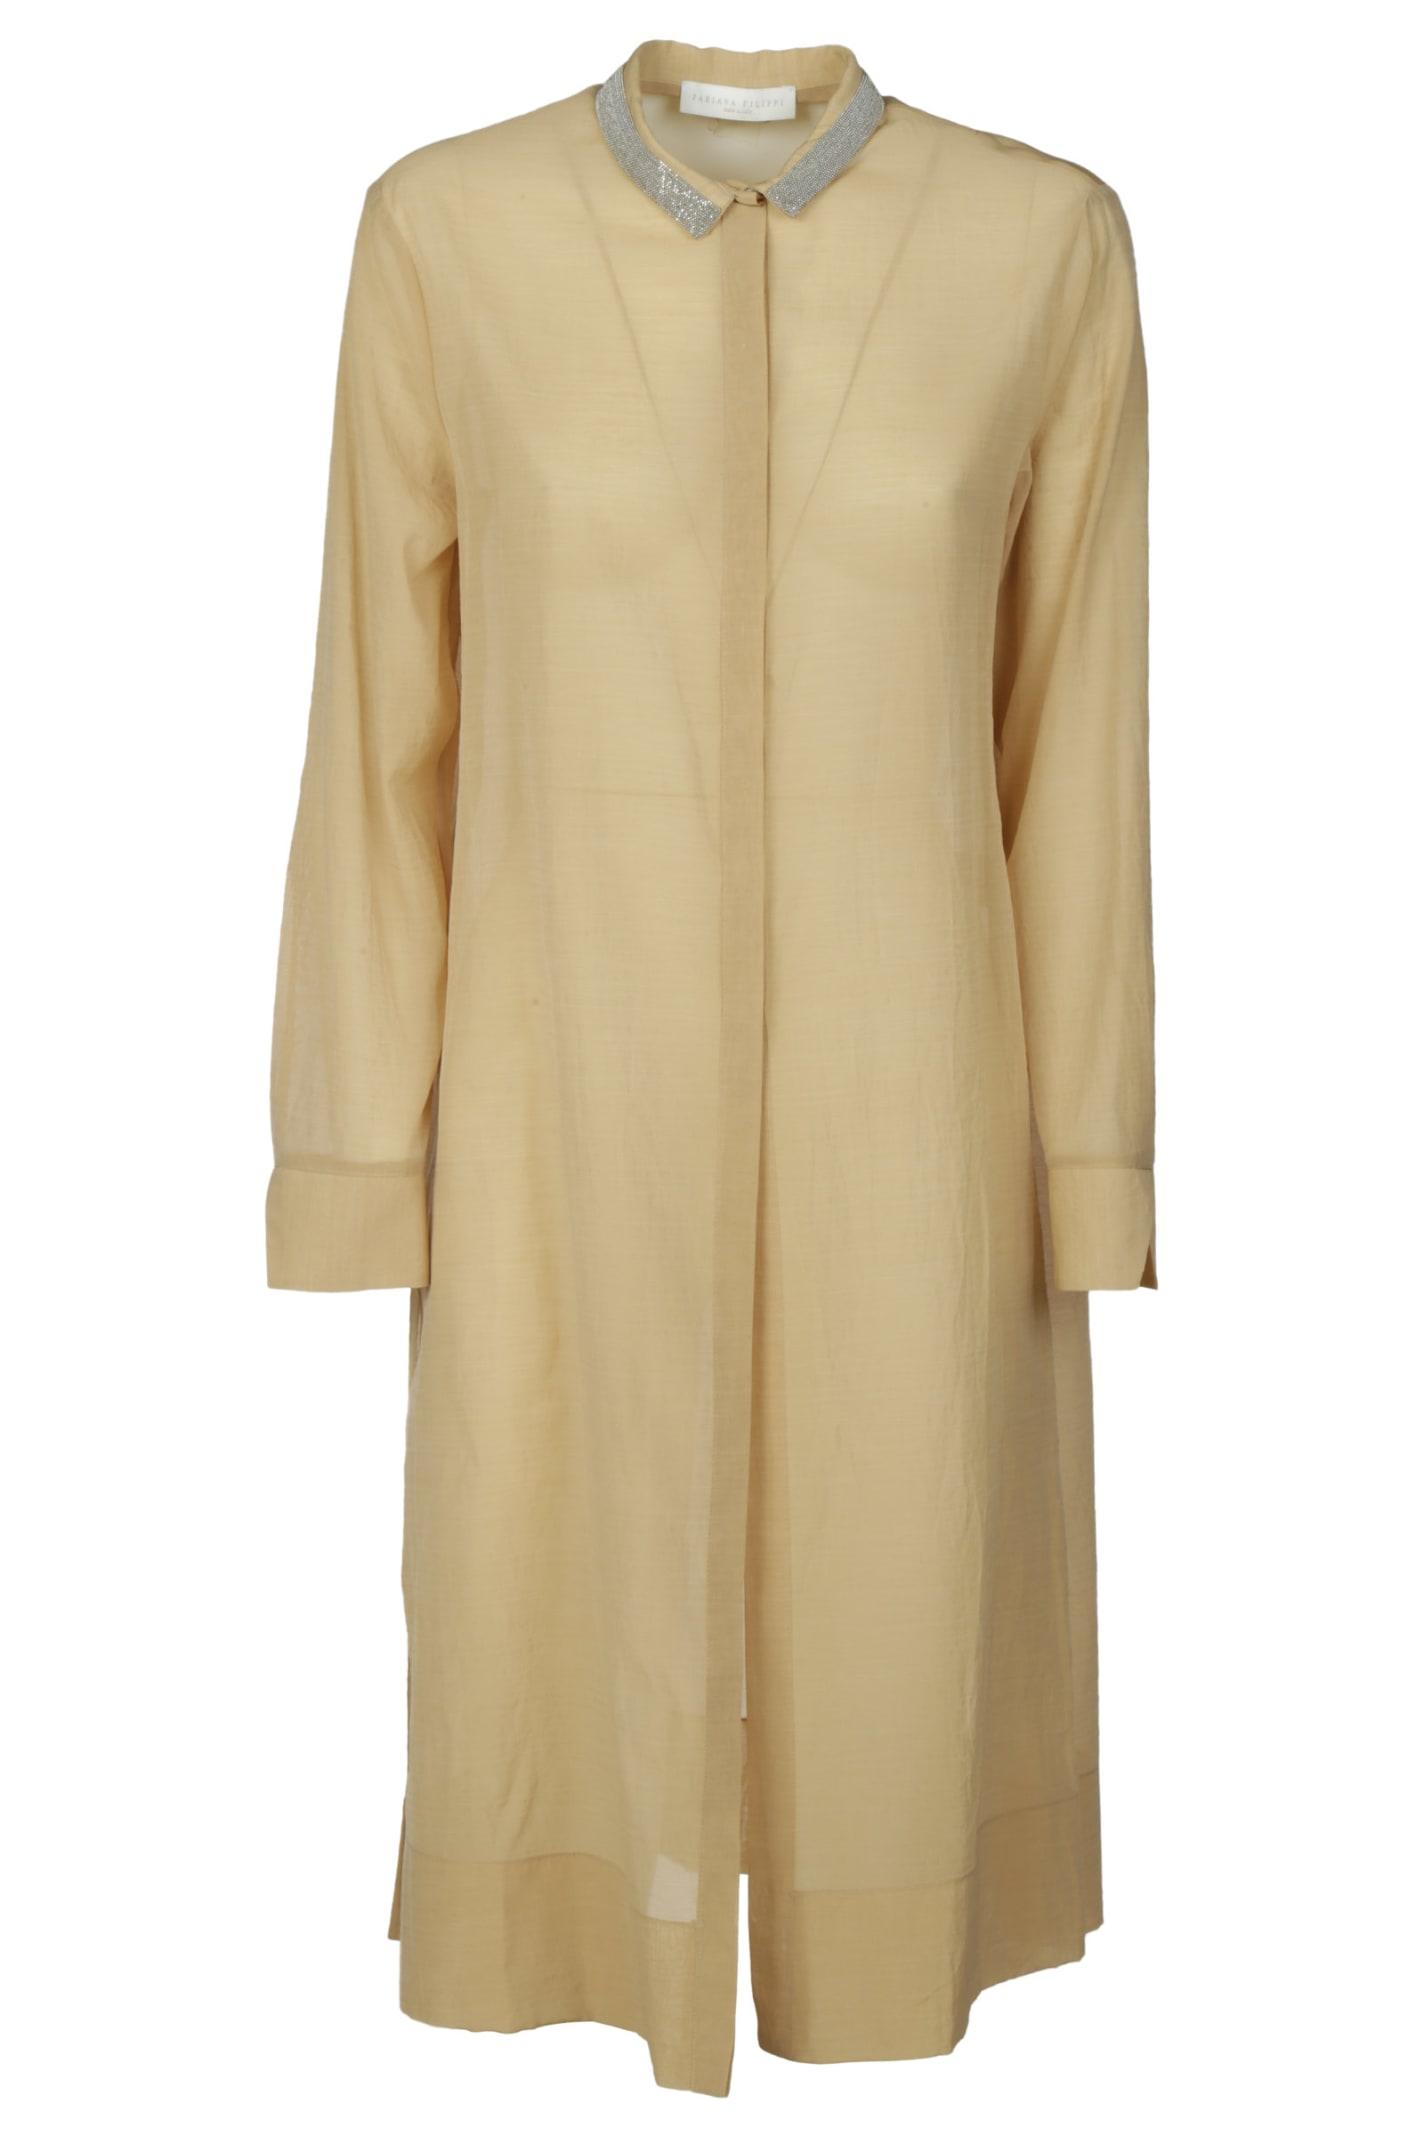 Buy Fabiana Filippi Long Shirt Dress online, shop Fabiana Filippi with free shipping